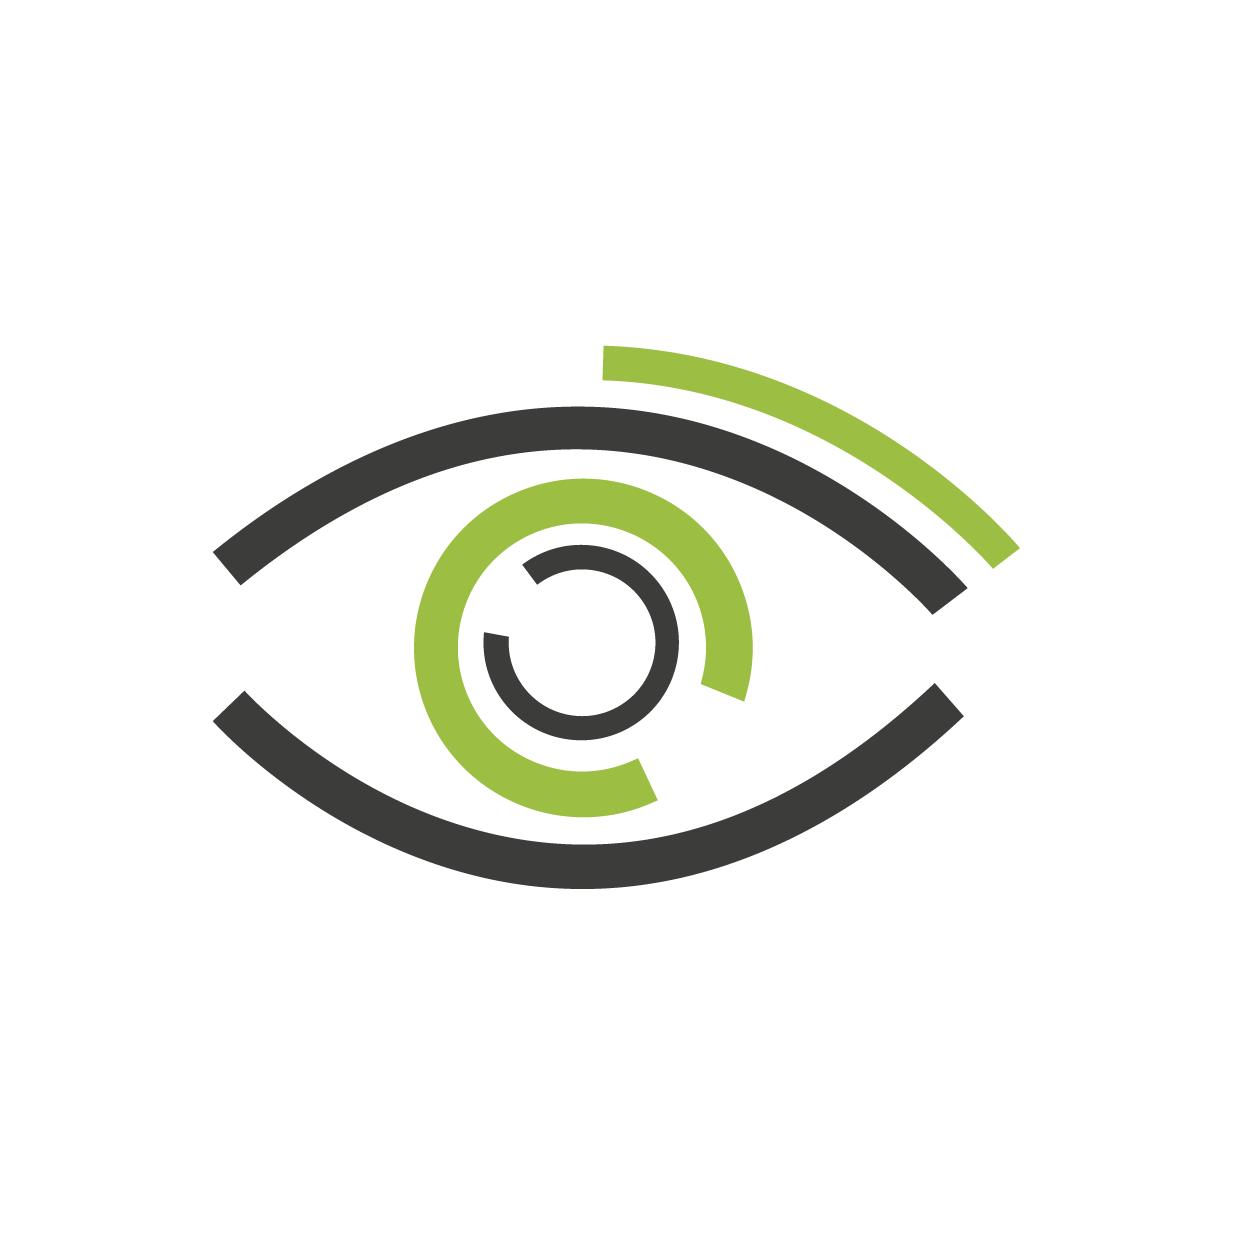 Active CCTV & Surveillance Systems Ltd